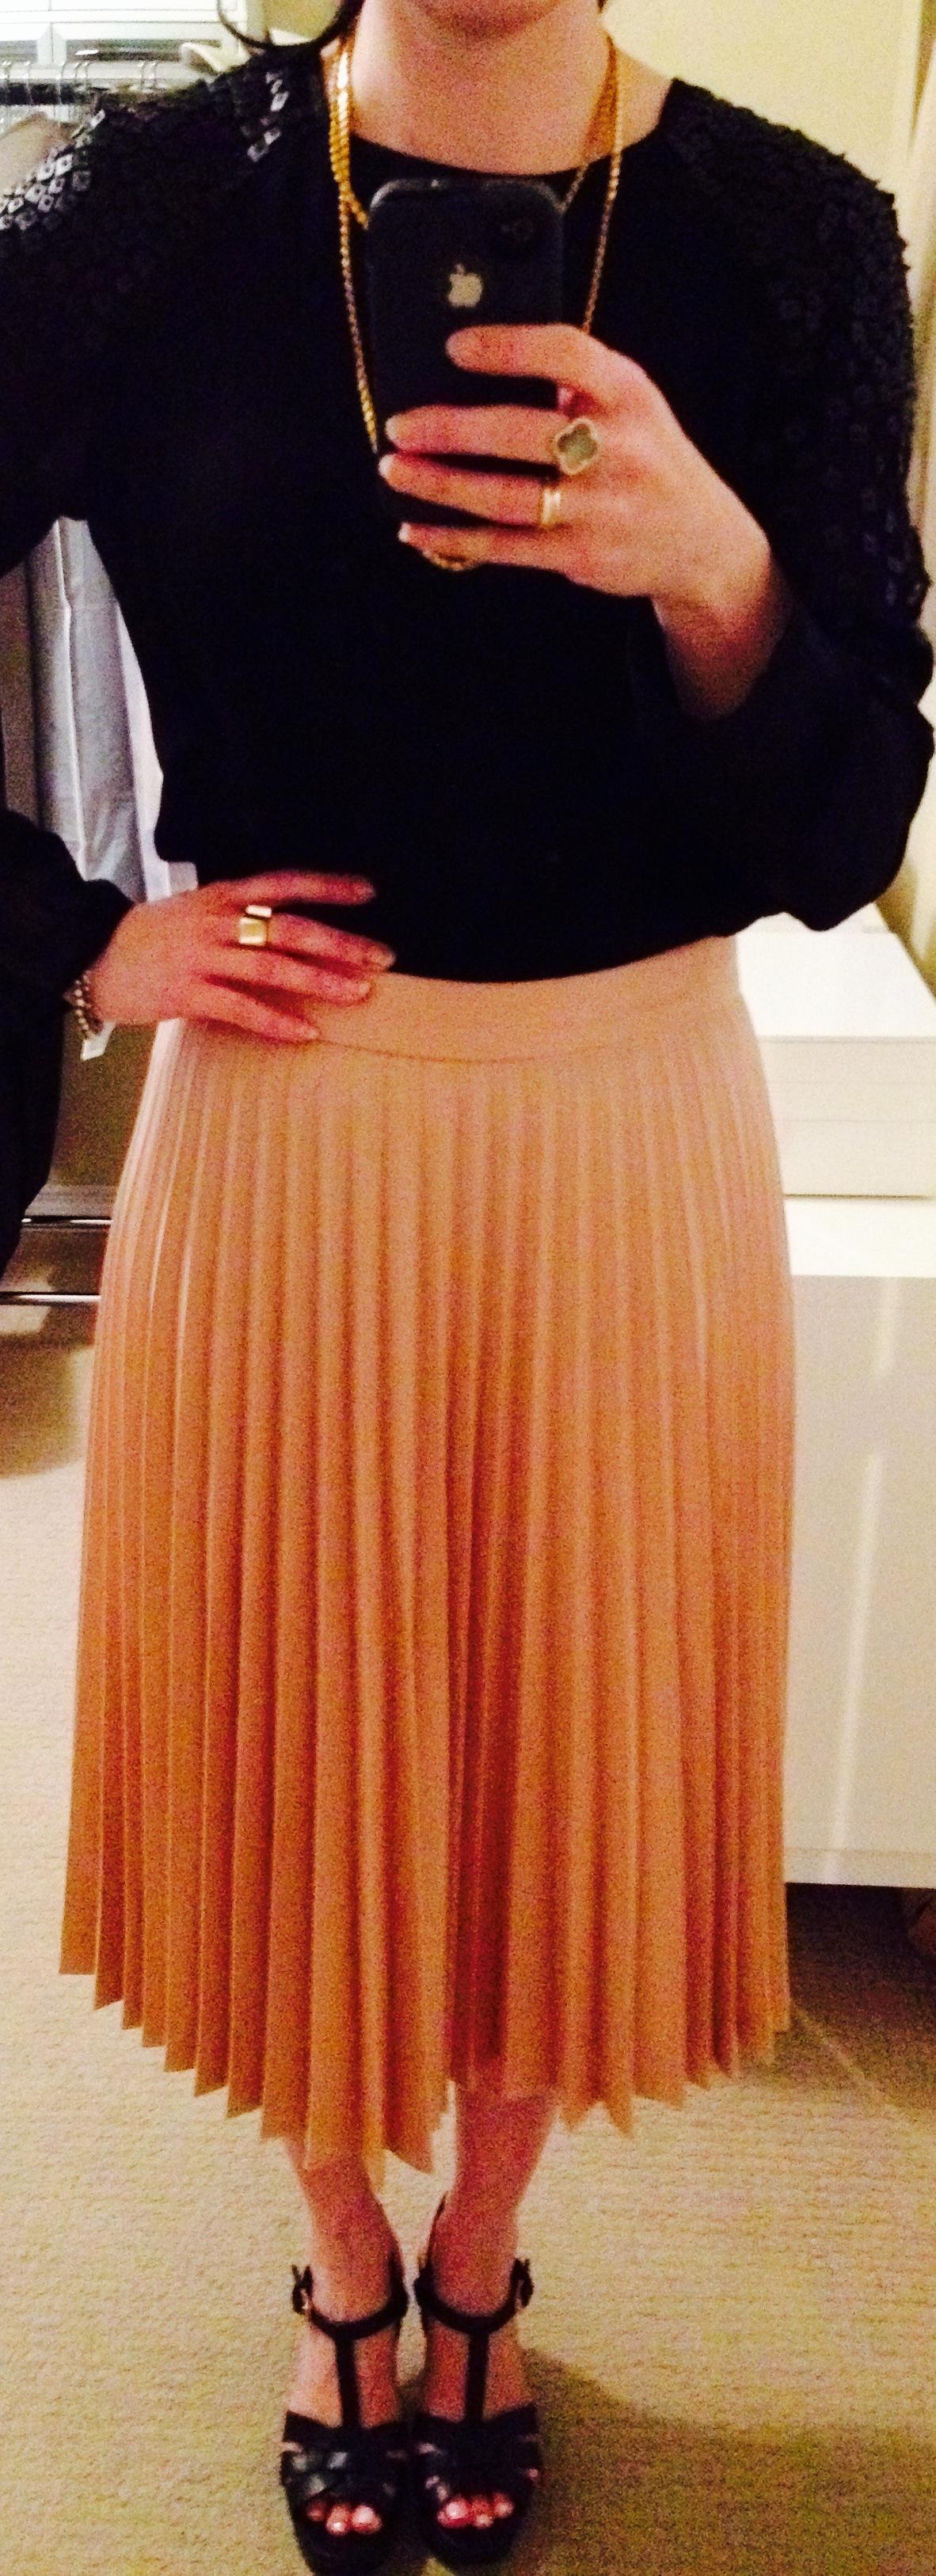 July 1, Pleated Skirt by Zara